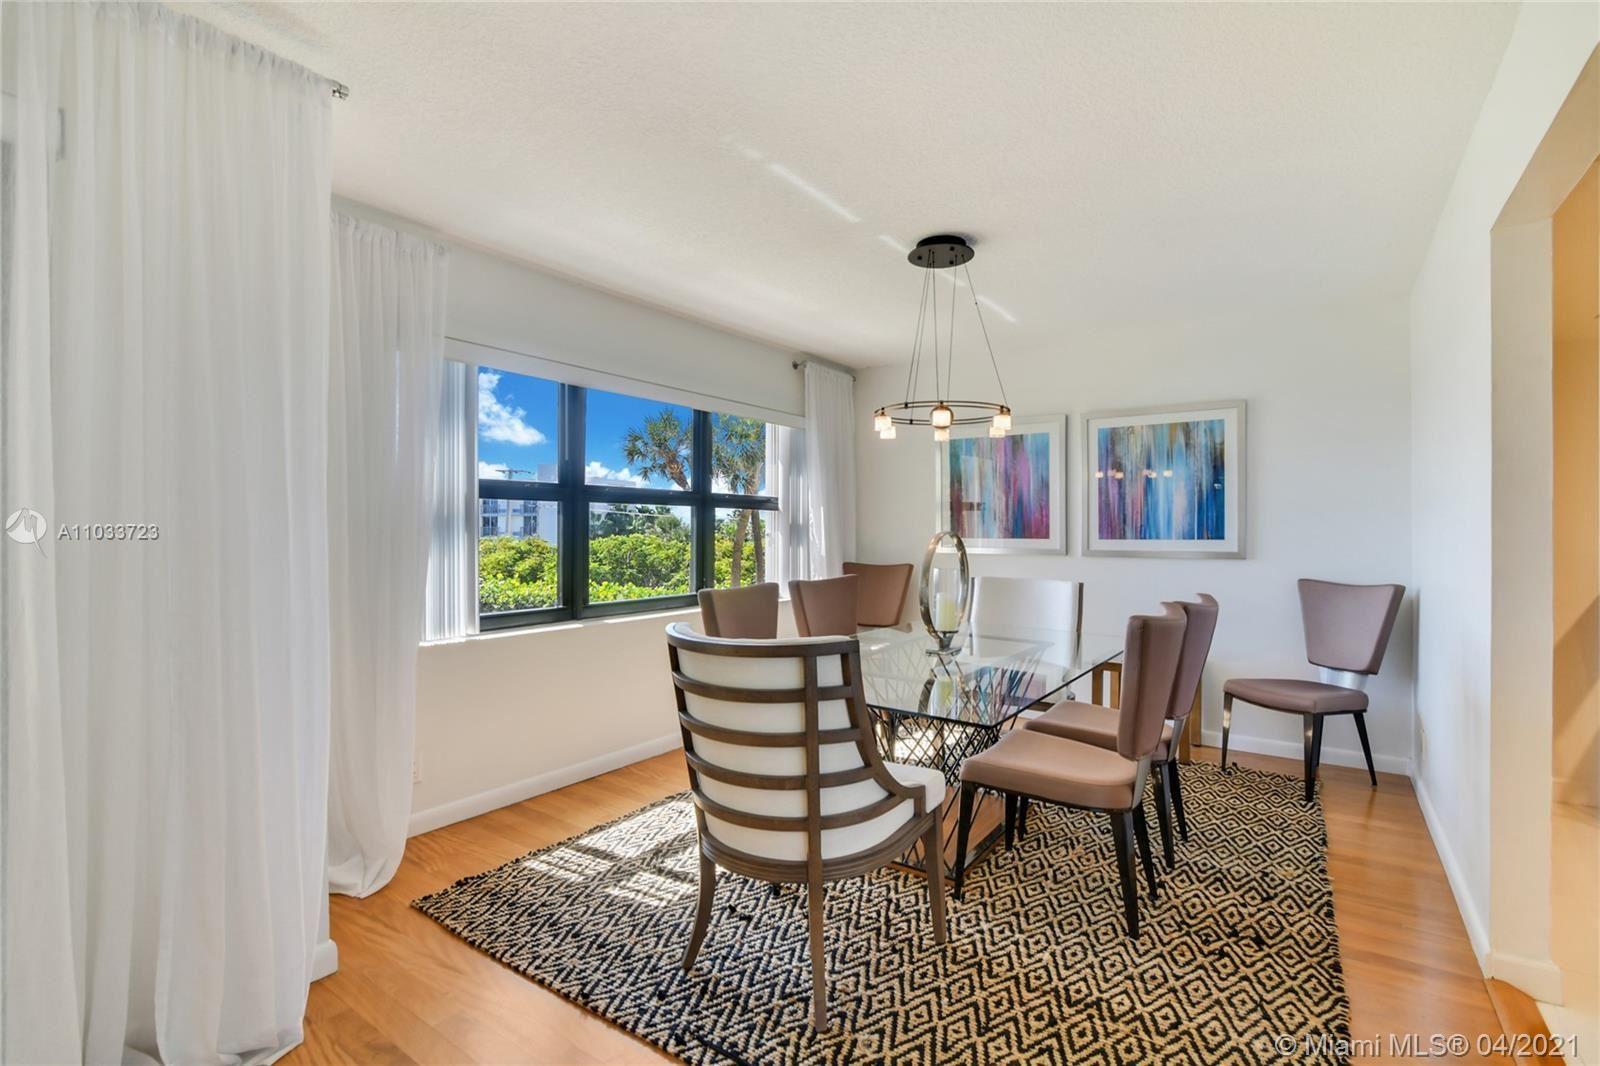 Photo of 4900 N Ocean Blvd #415, Lauderdale By The Sea, FL 33308 (MLS # A11033723)